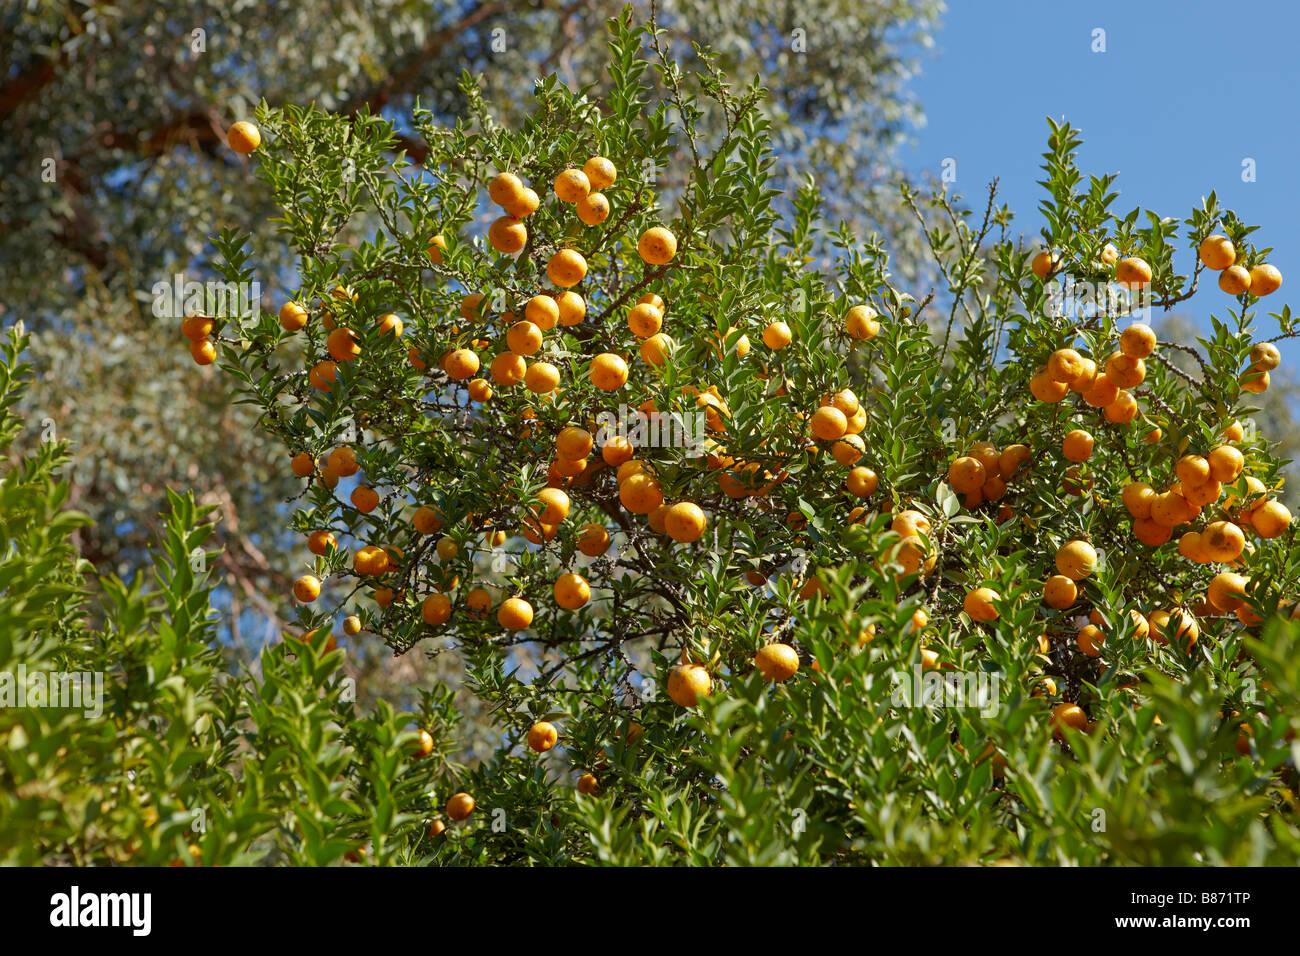 Los Angeles County Arboretum And Botanic Garden, Los Angeles, California,  USA